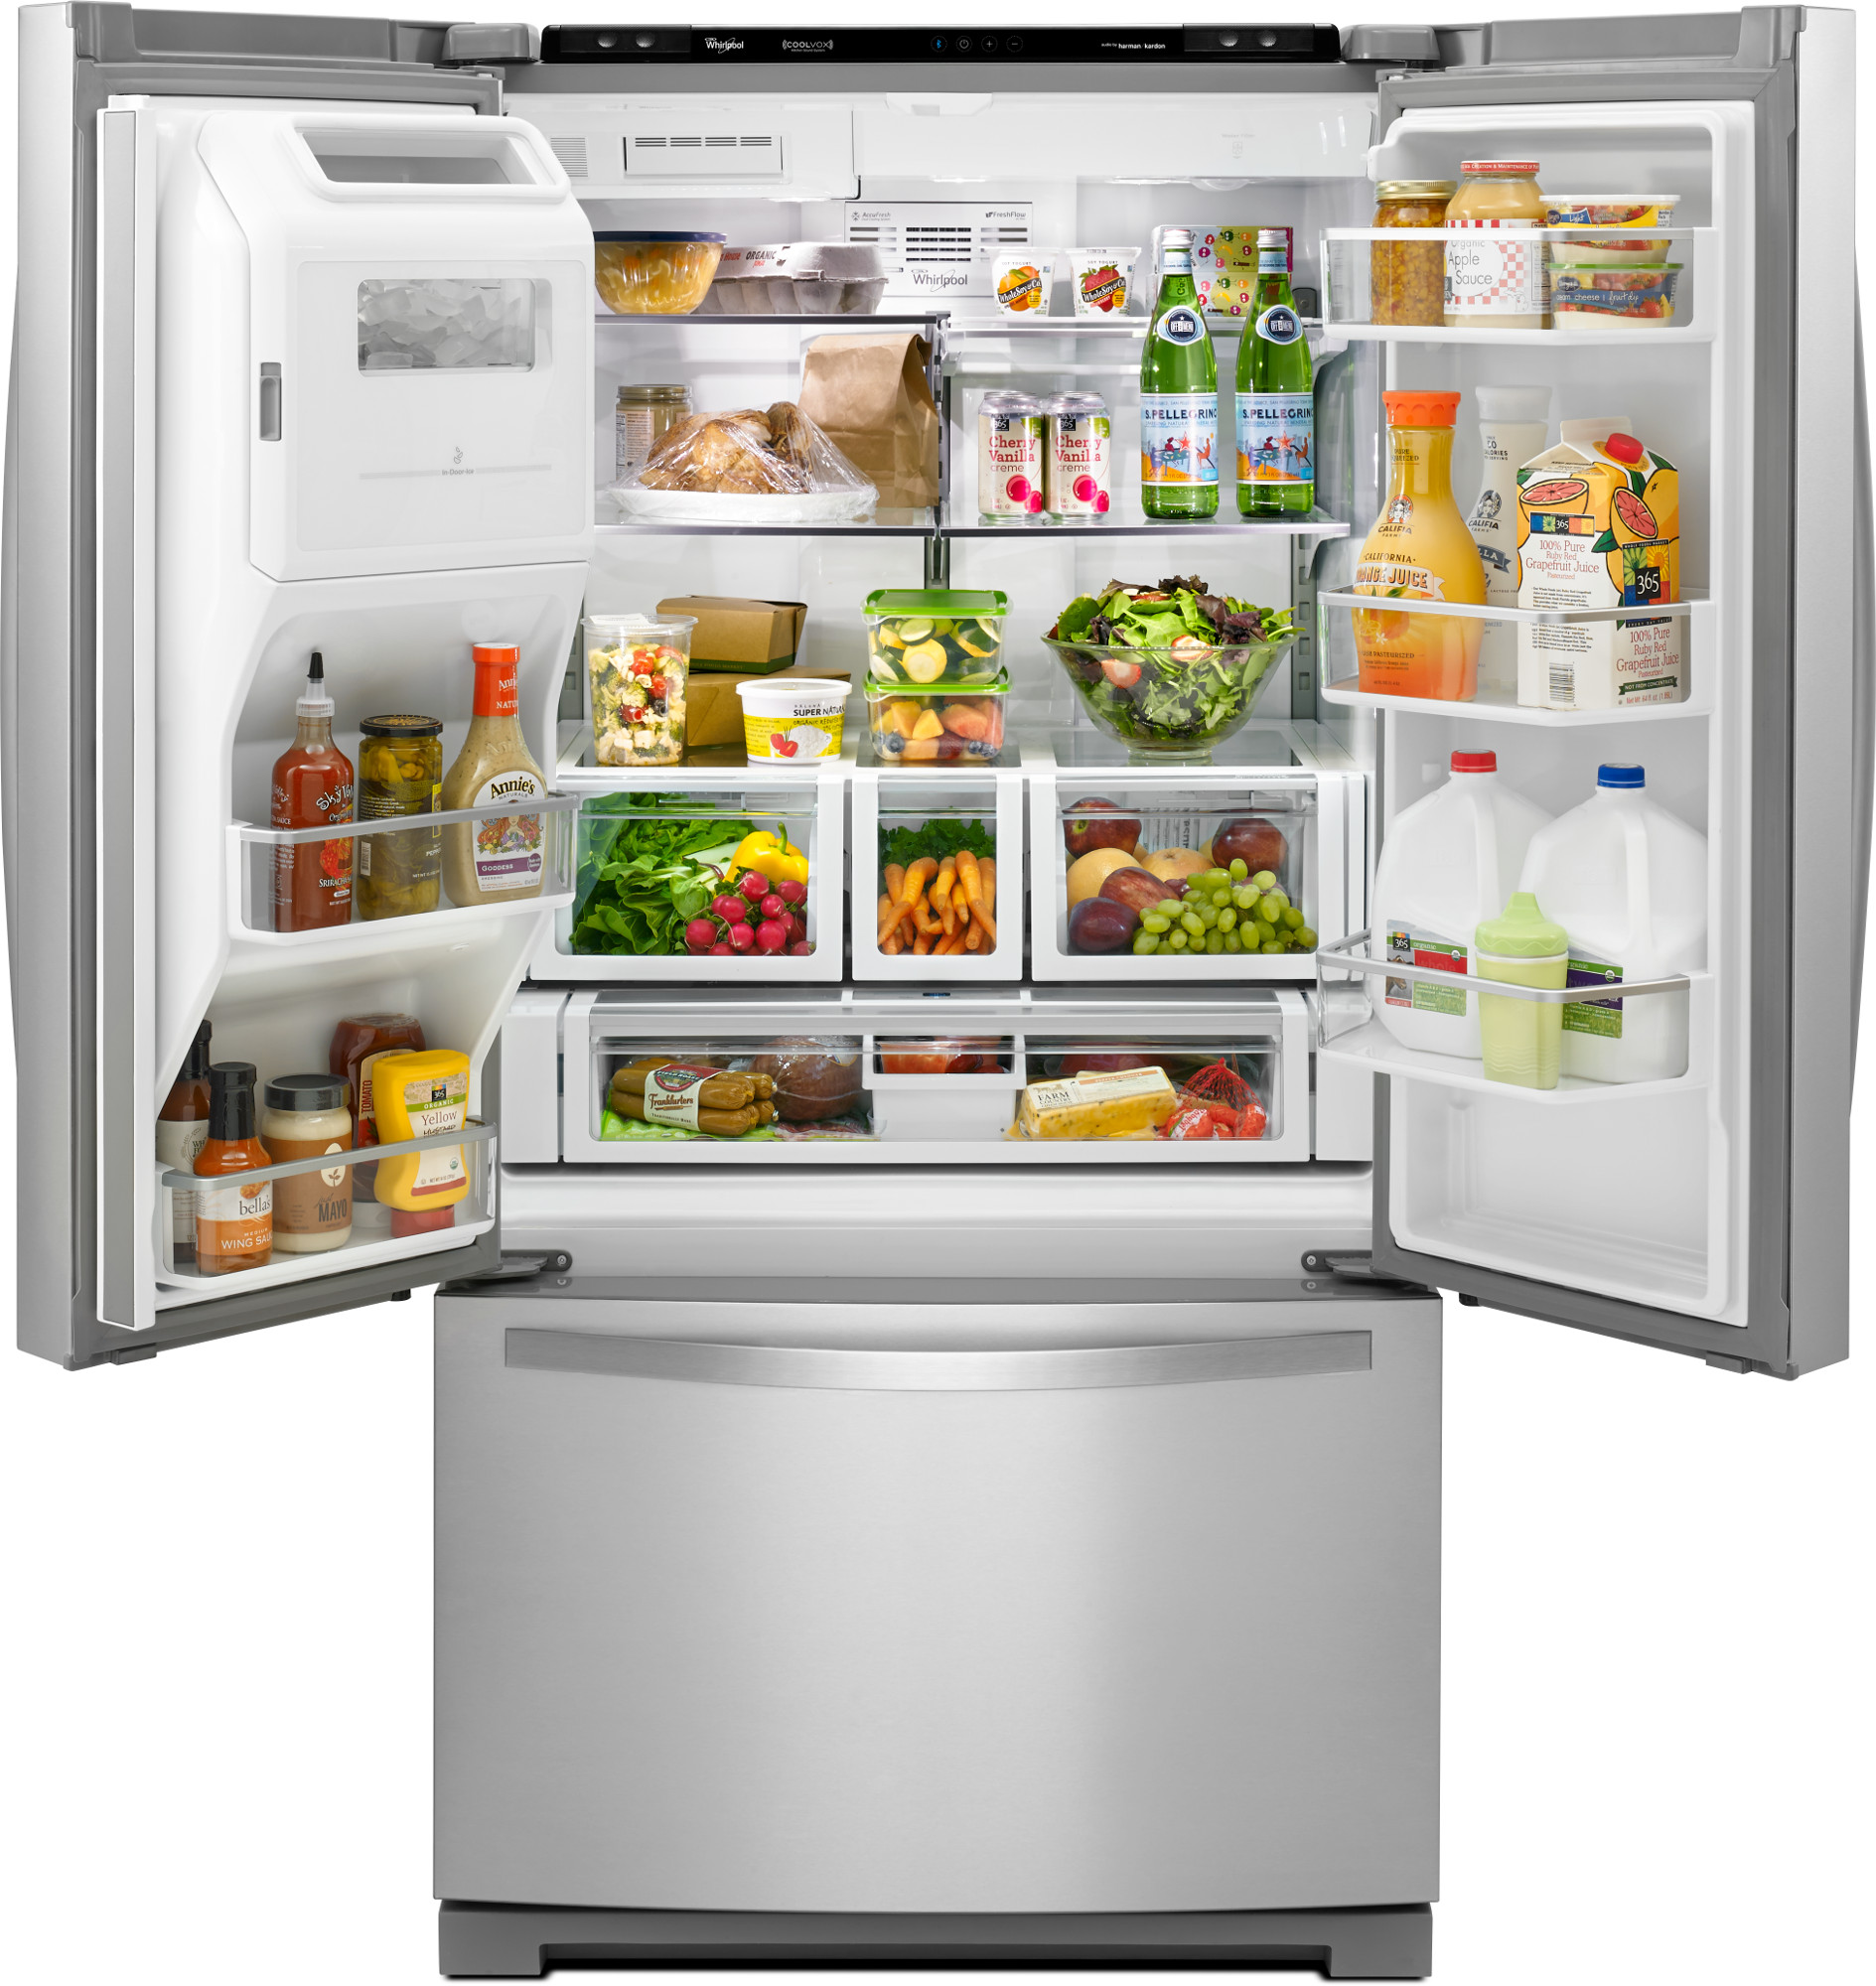 Whirlpool WRF997SDDM 27 cu. ft. French Door Refrigerator w/ Cool Vox™ Sound System - Stainless Steel WRF997SDDM